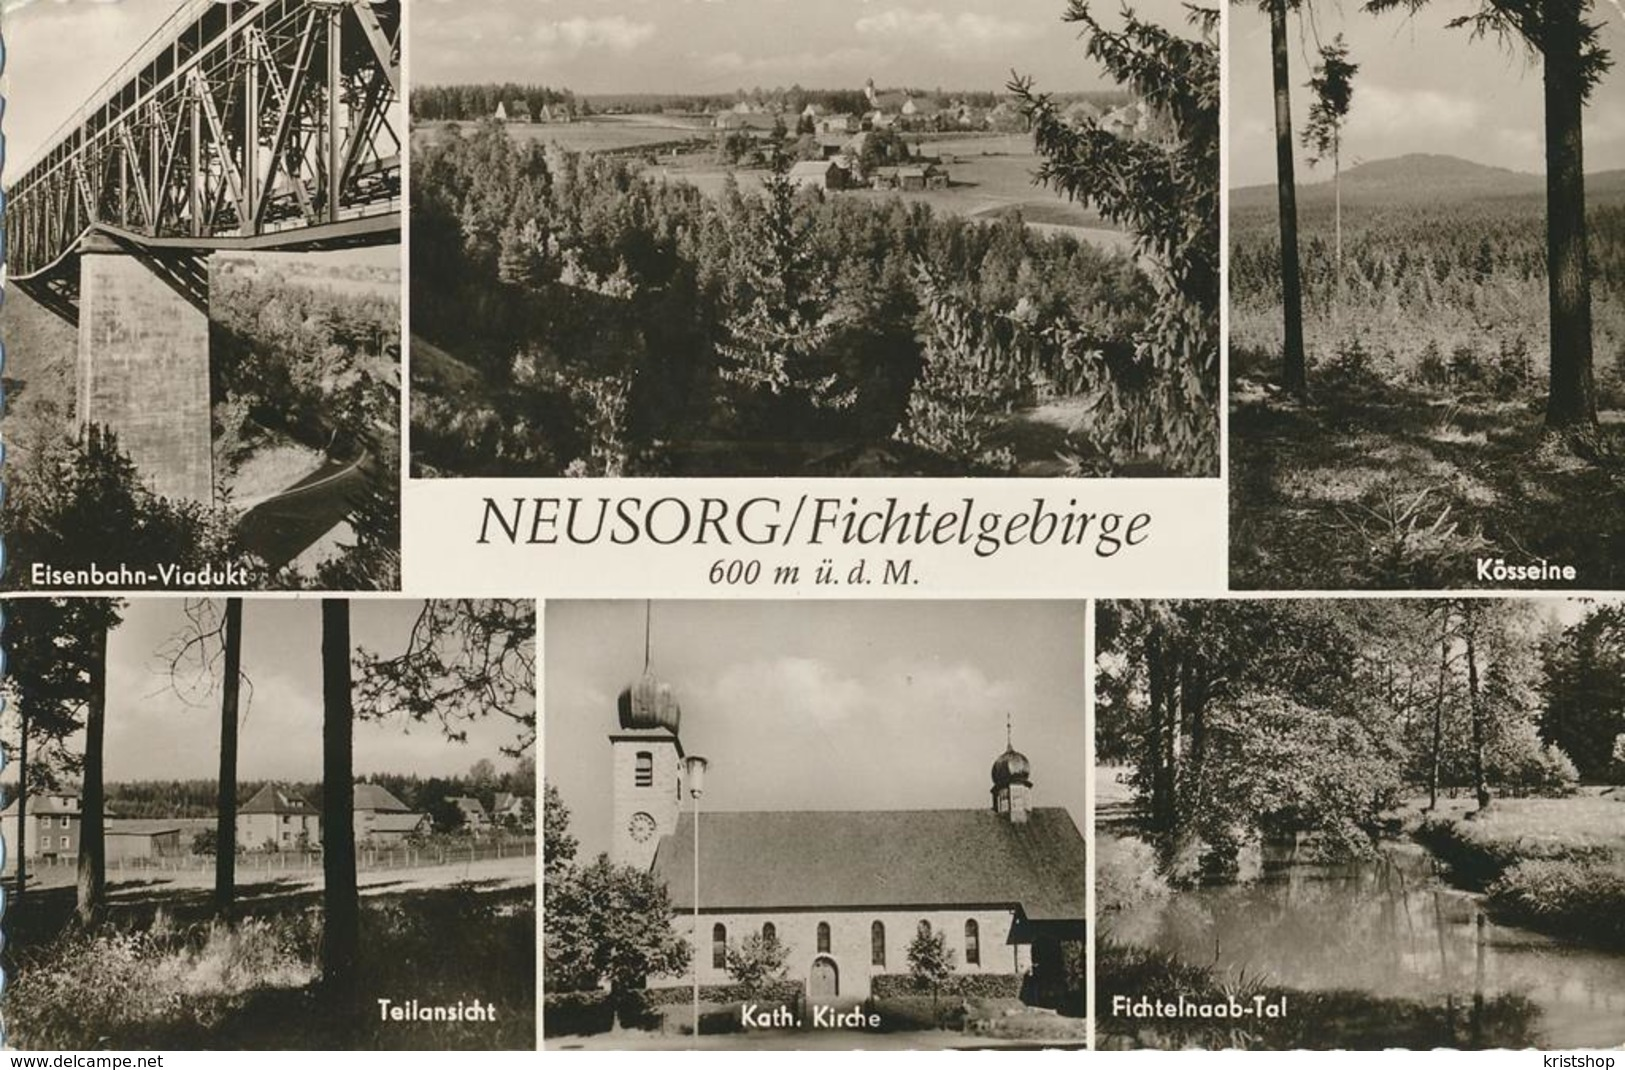 Neusorg -Fichtelgebirge [AA12-1250 - Germany